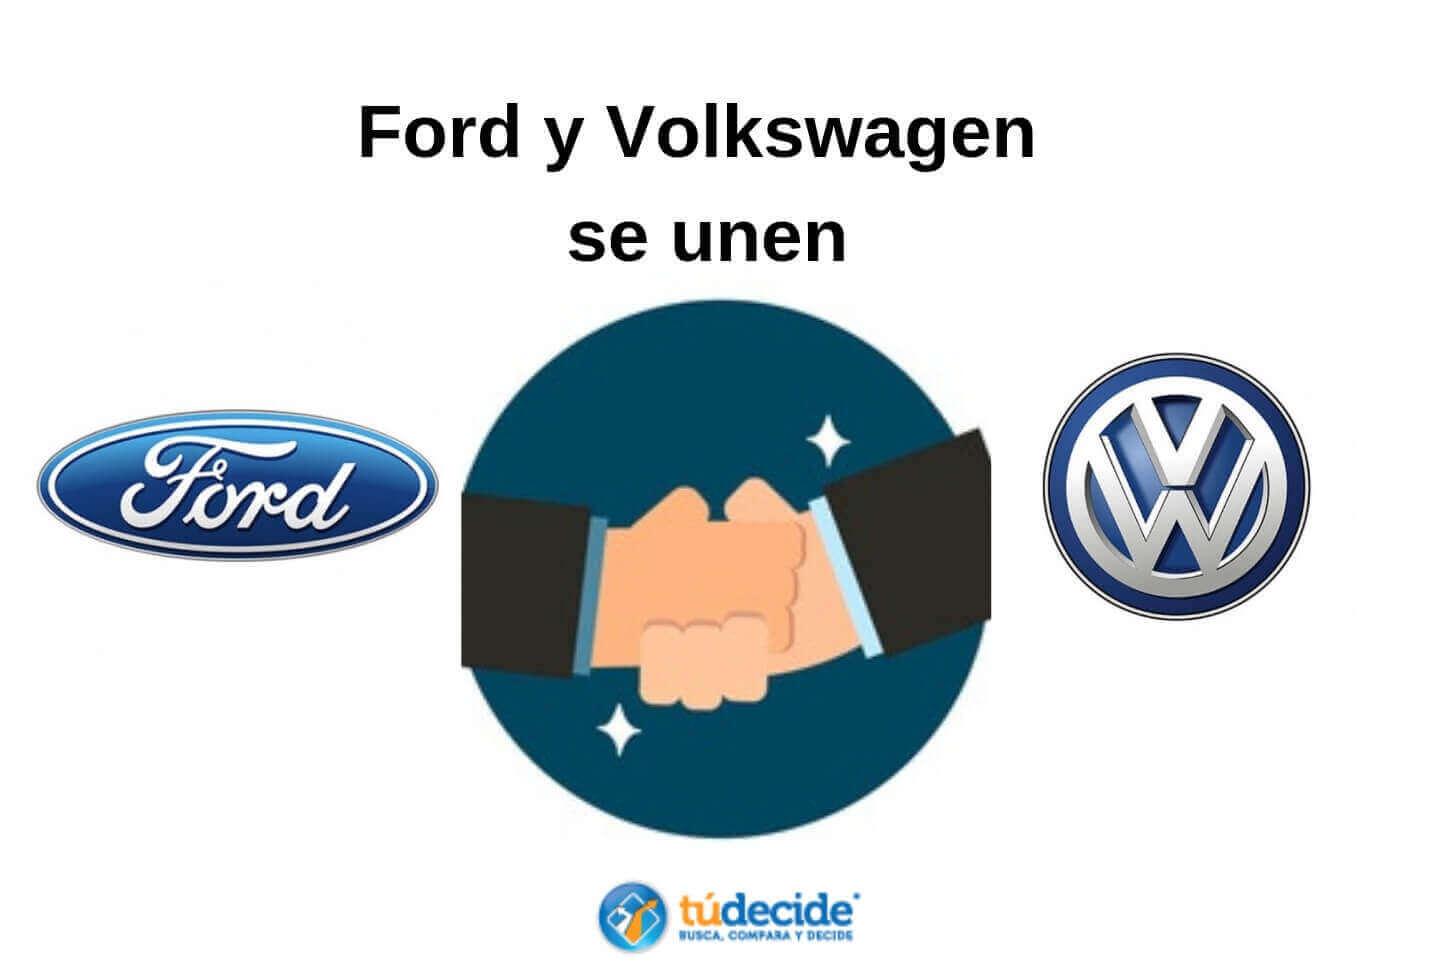 Ford y Volkswagen